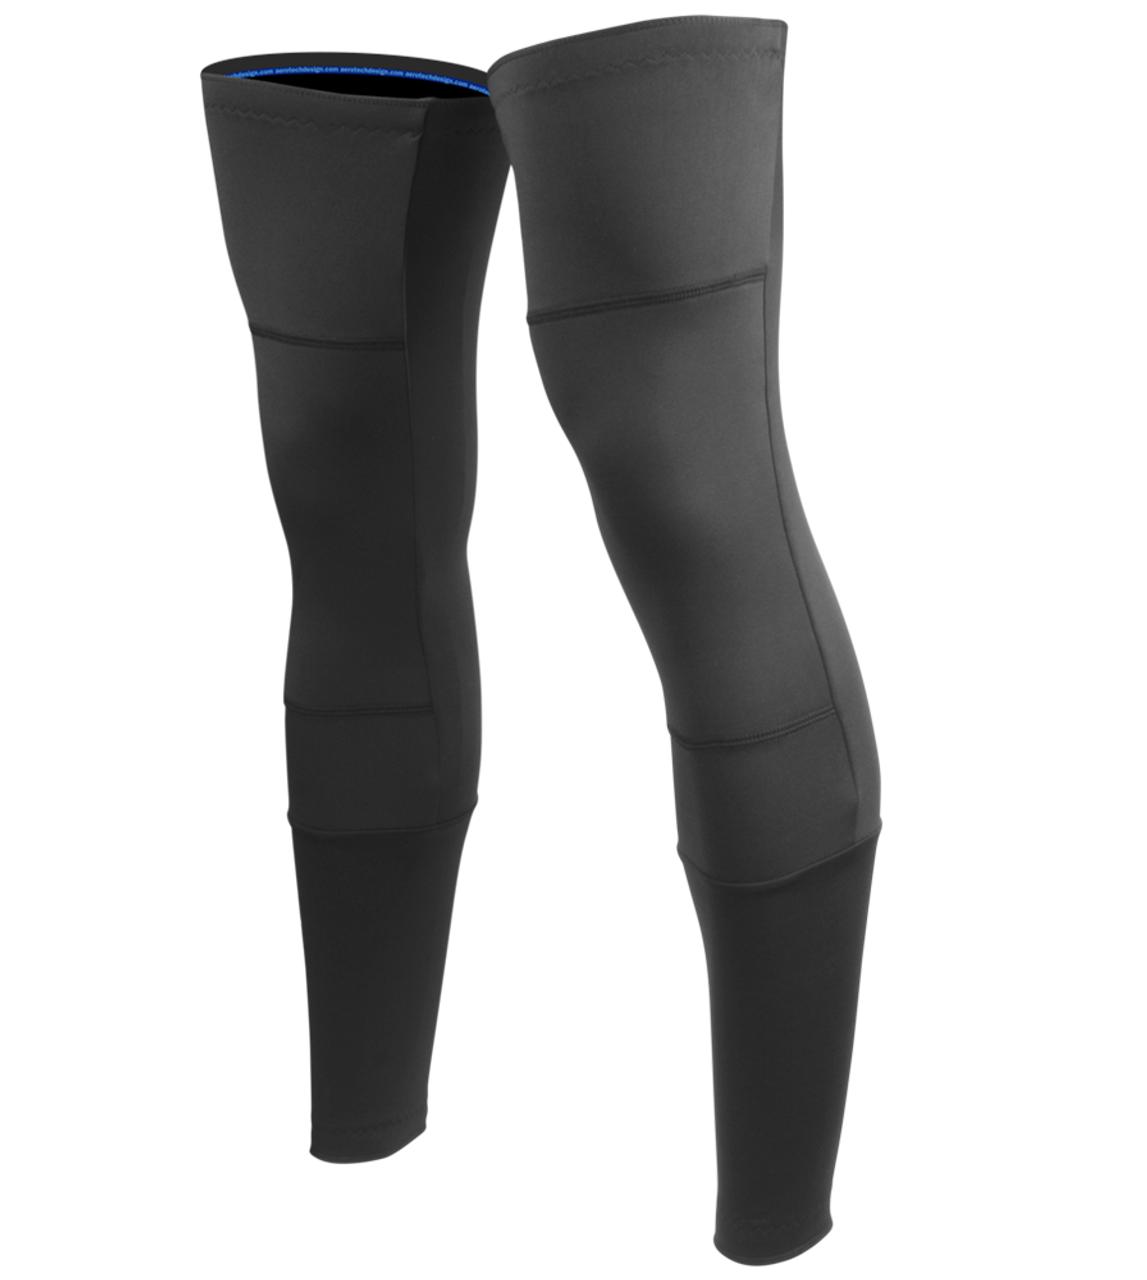 289b78fafe Aero Tech Designs Leg Warmers Stretch Fleece Double Layer Knee Warmer